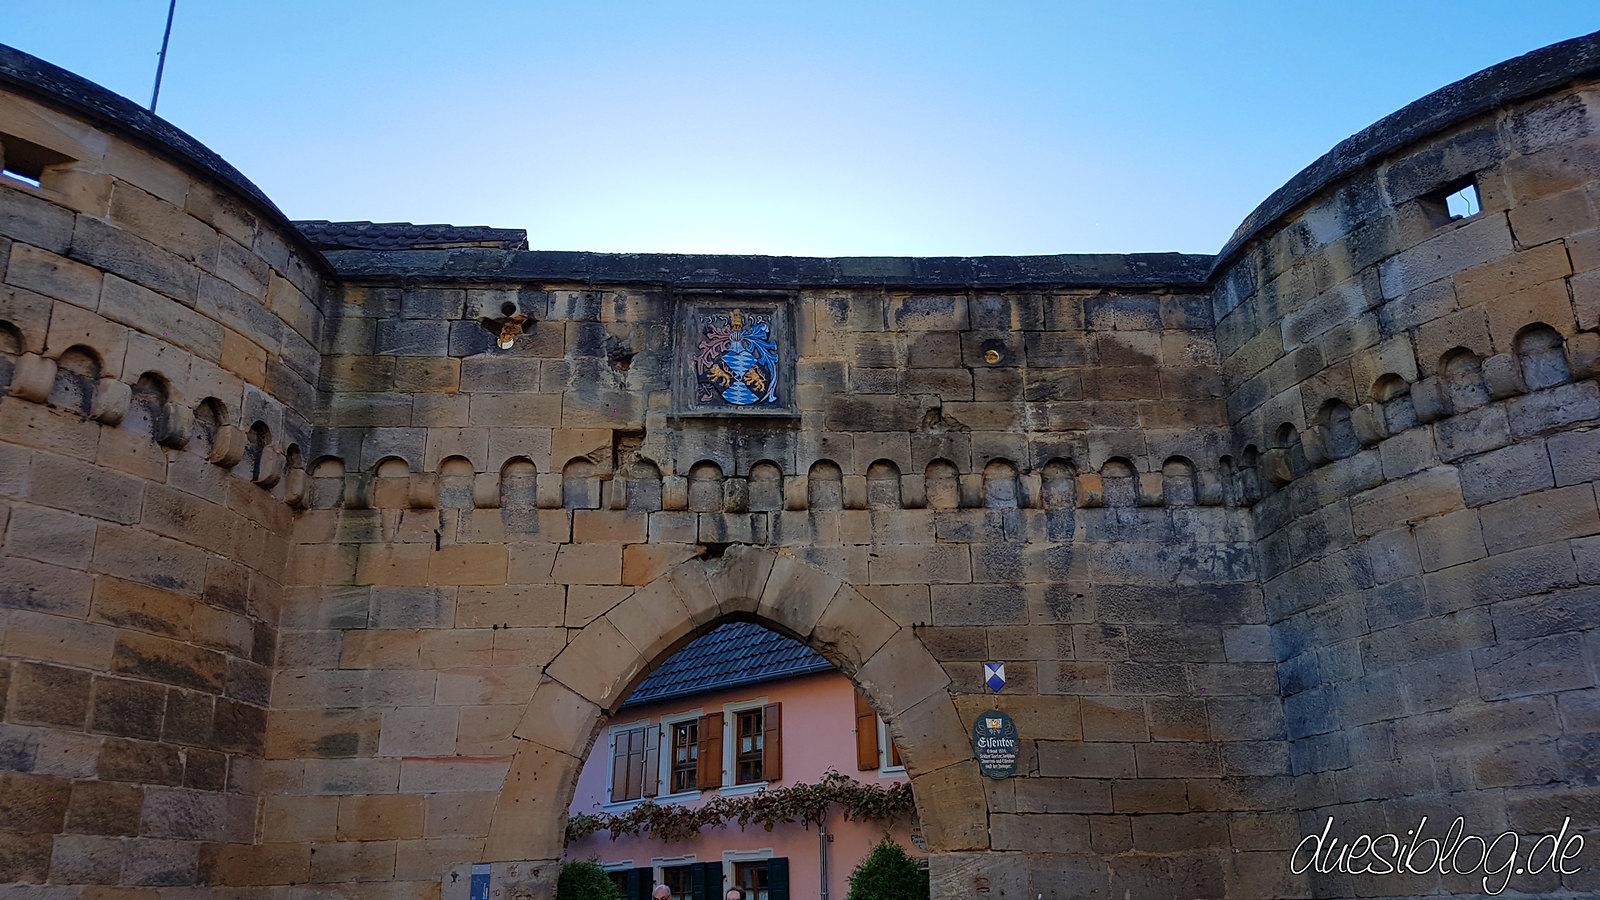 Freinsheim Pfalz duesiblog travelblog 25